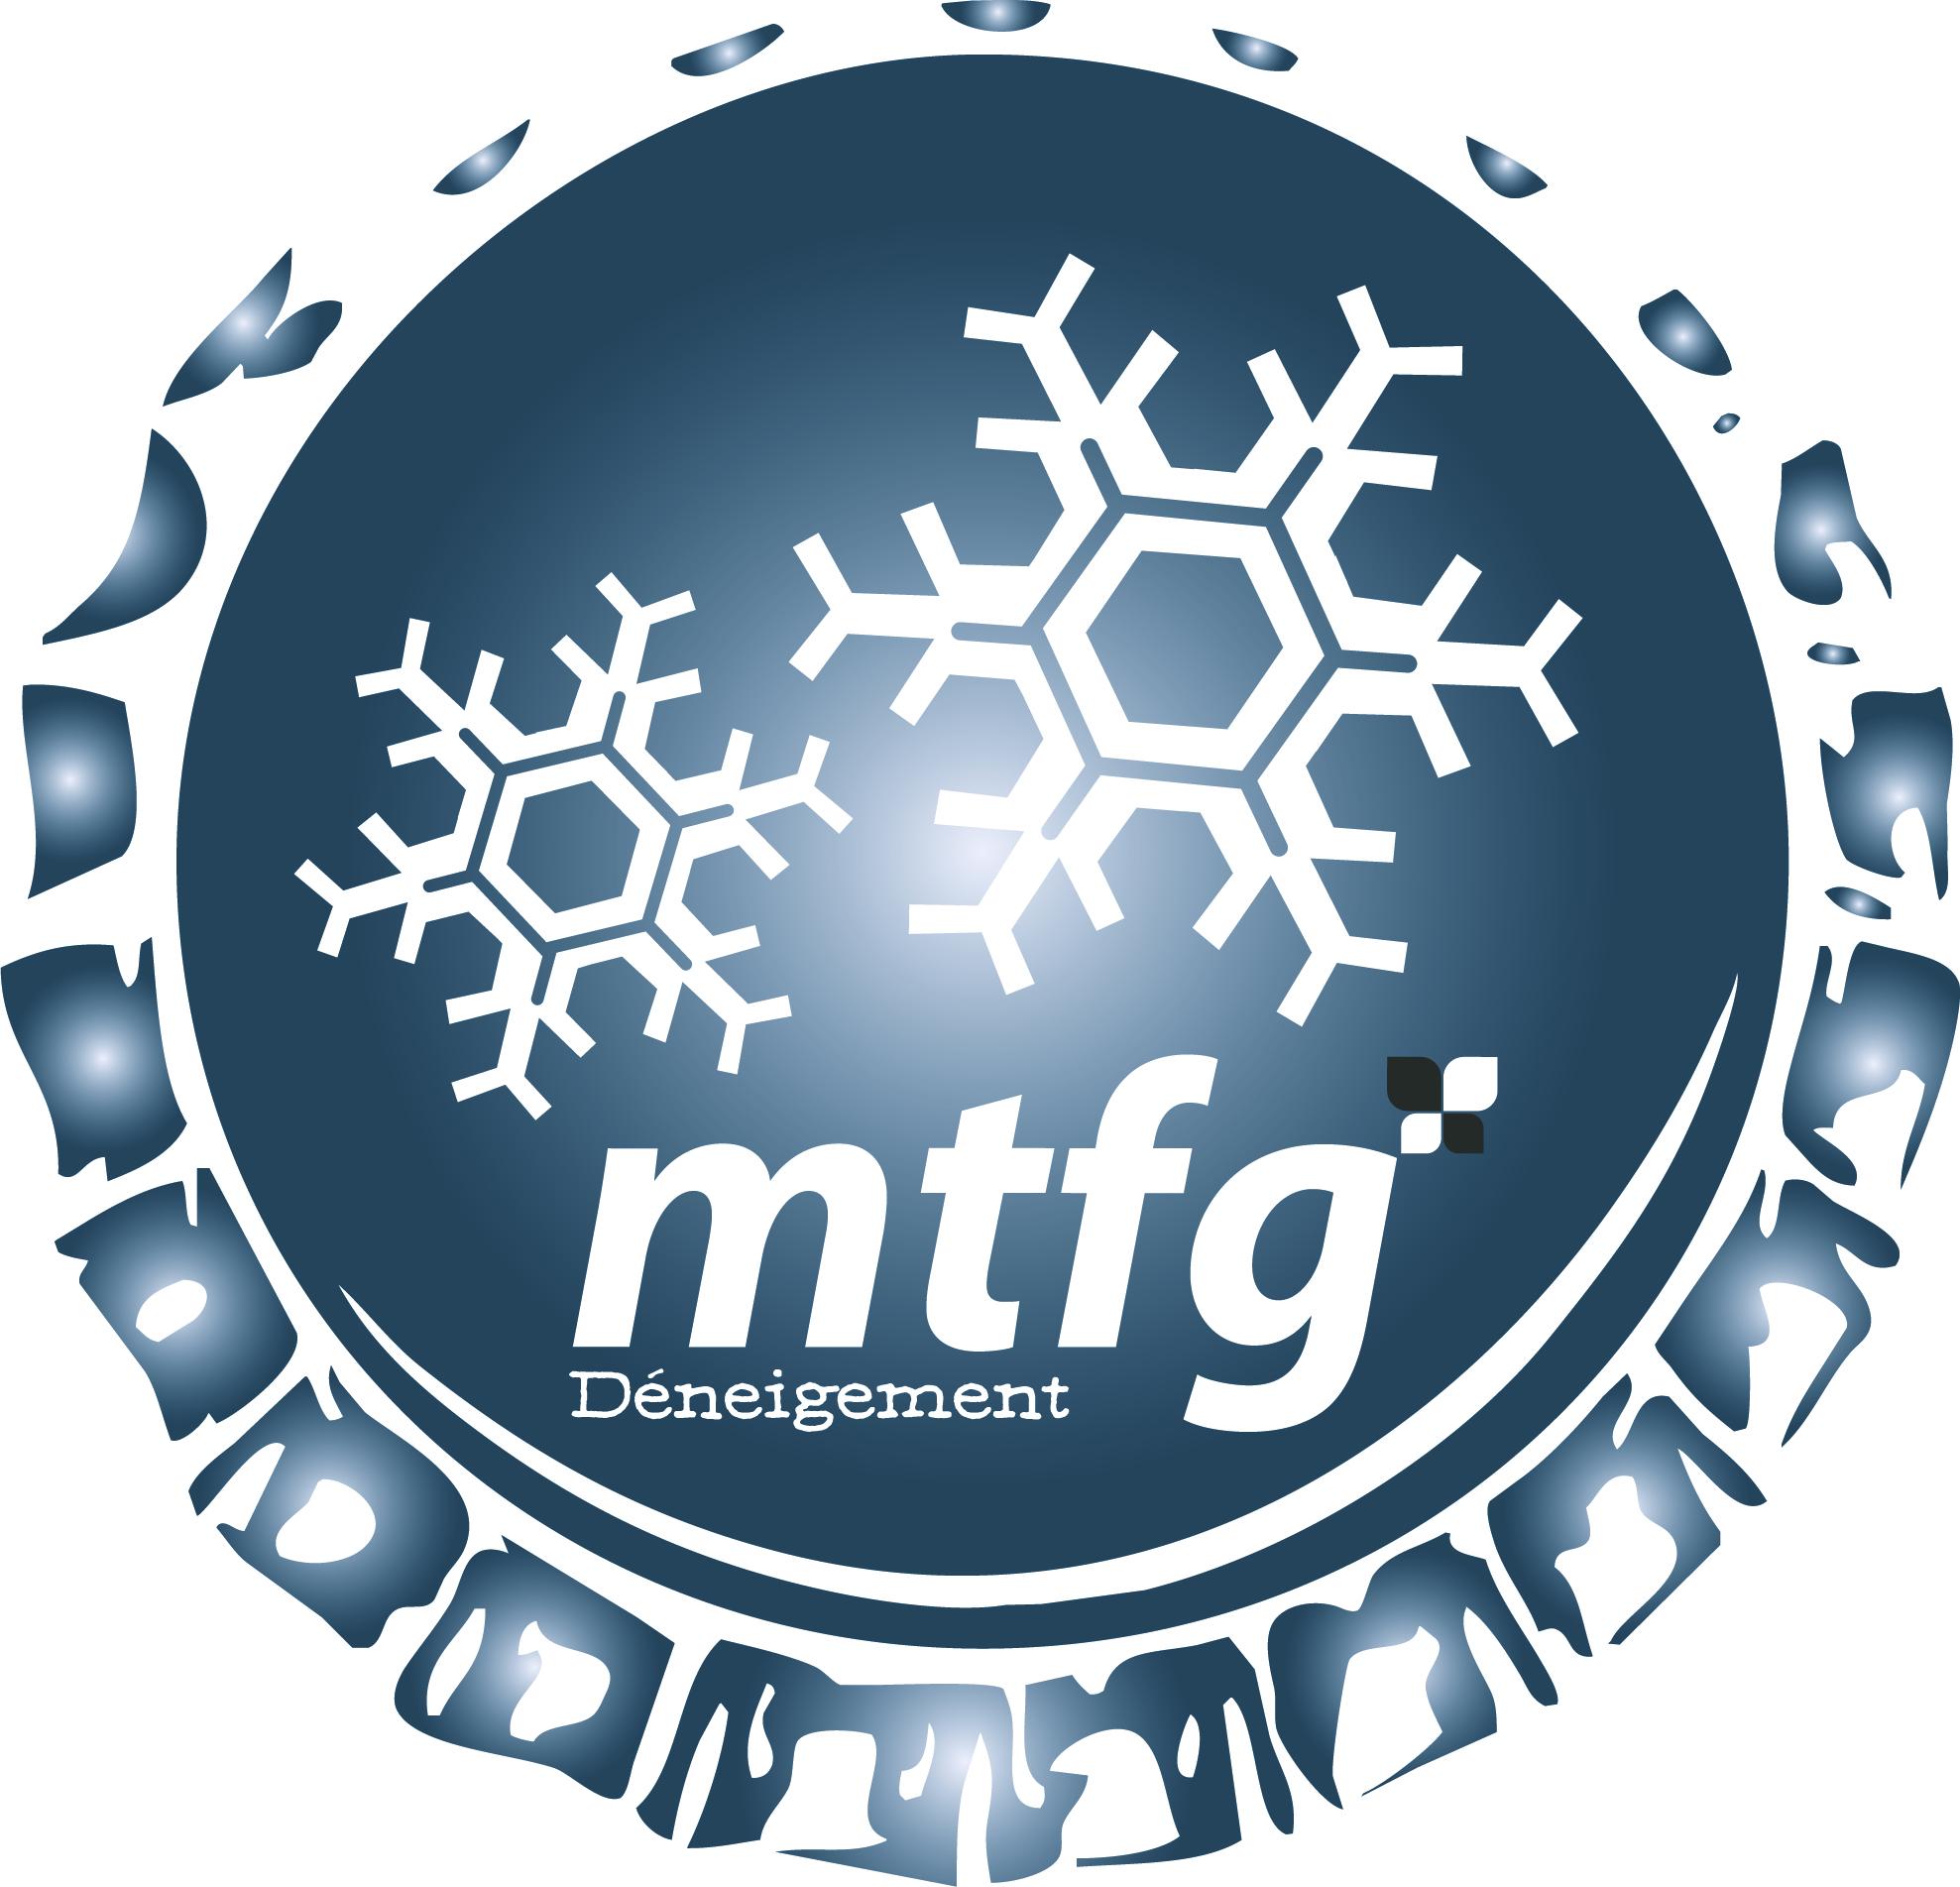 MTFG Deneigement